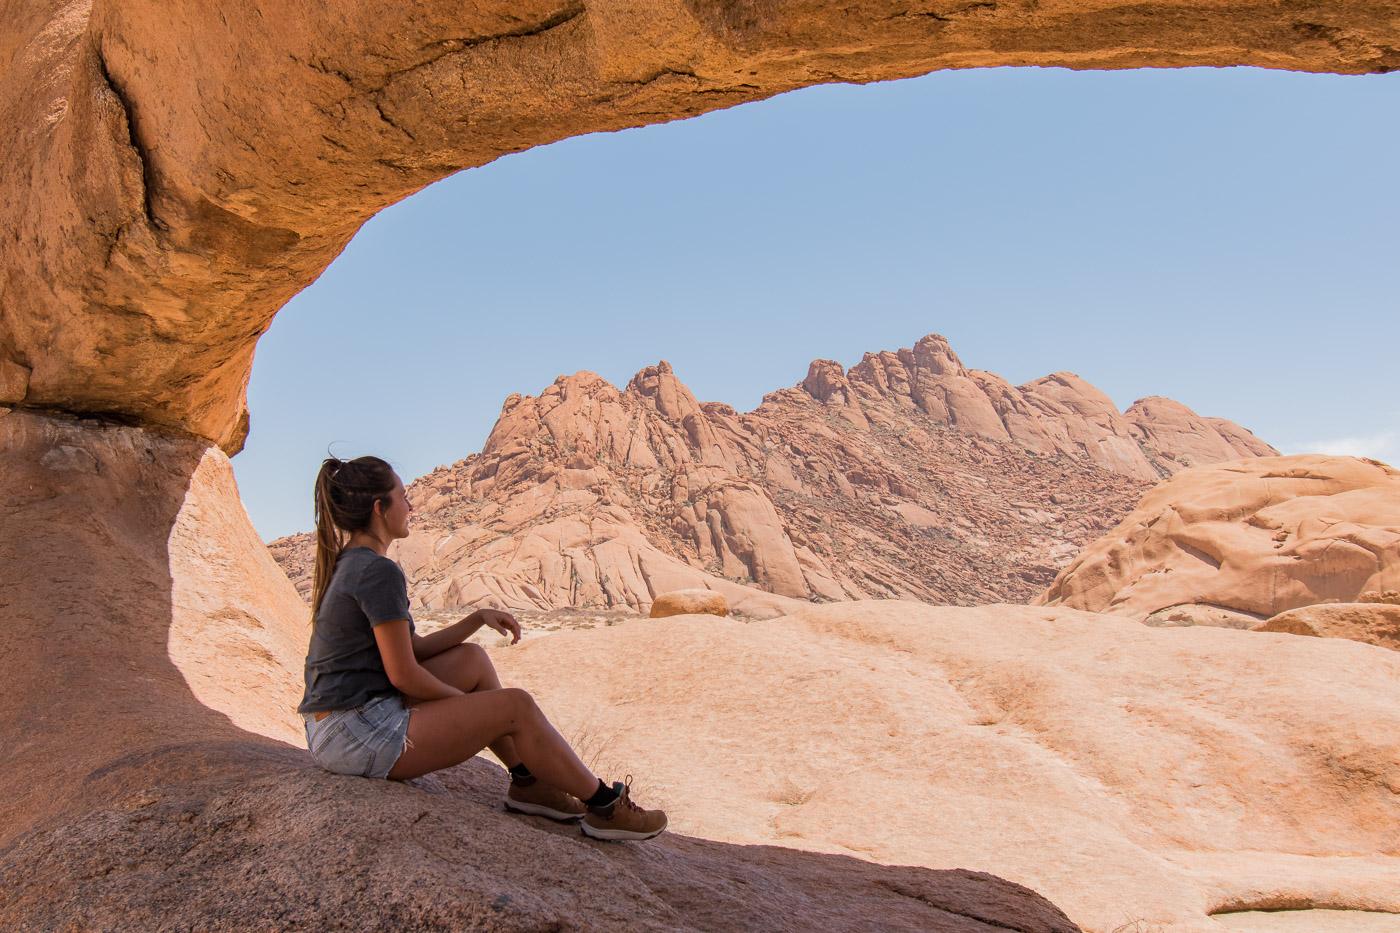 Namibie Spitzkoppe rock arch tips damaraland